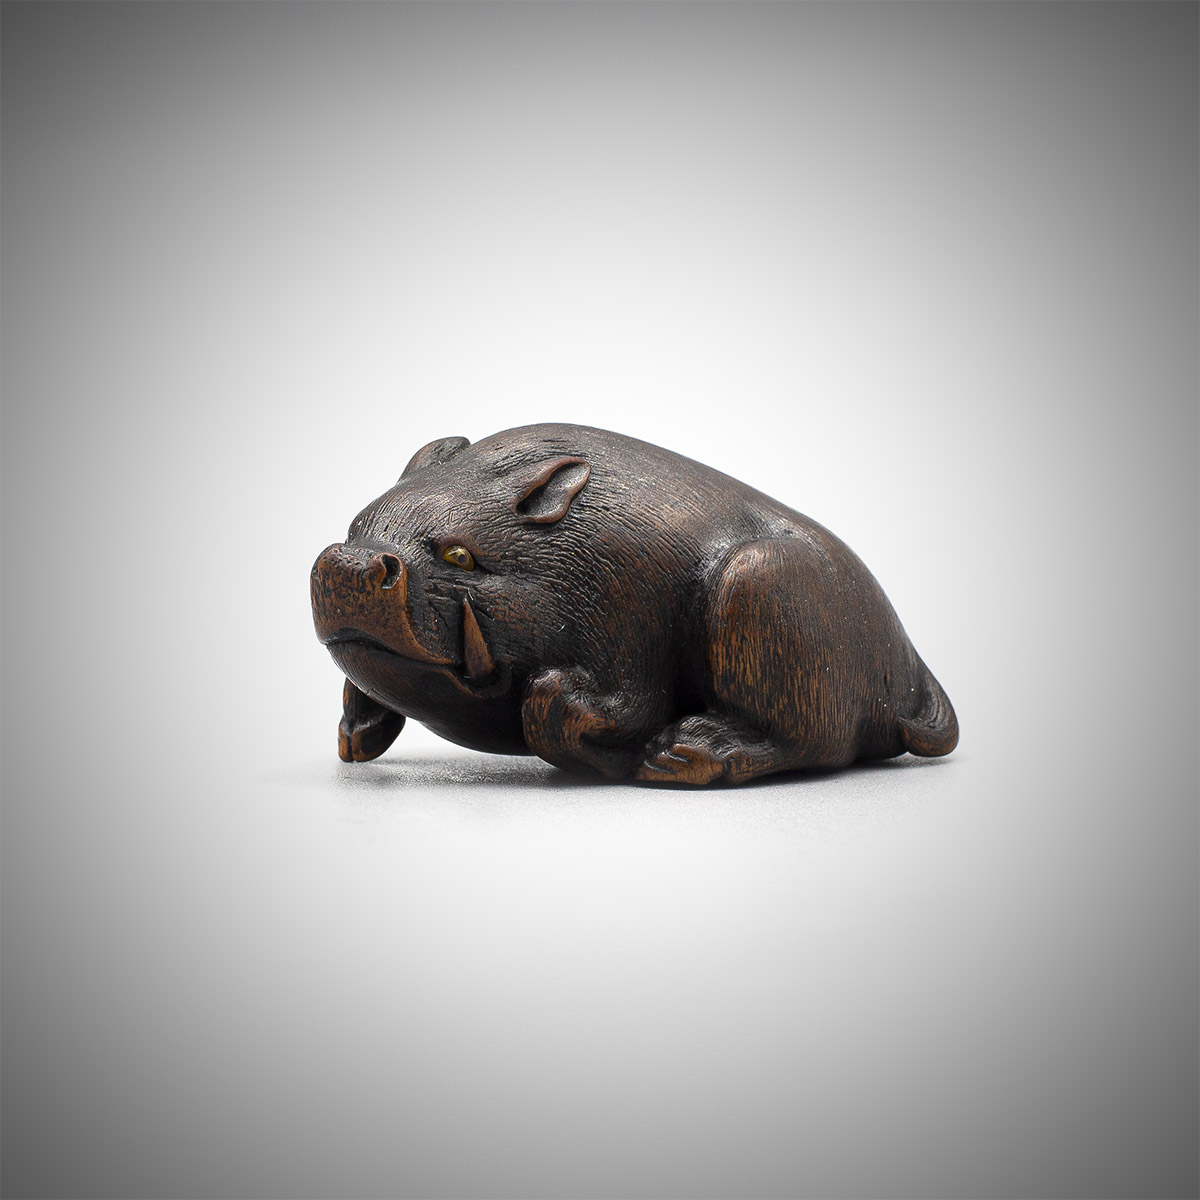 Wood Netsuke of a Resting Boar by Hokyudo Itsumin, MR3369_v.1